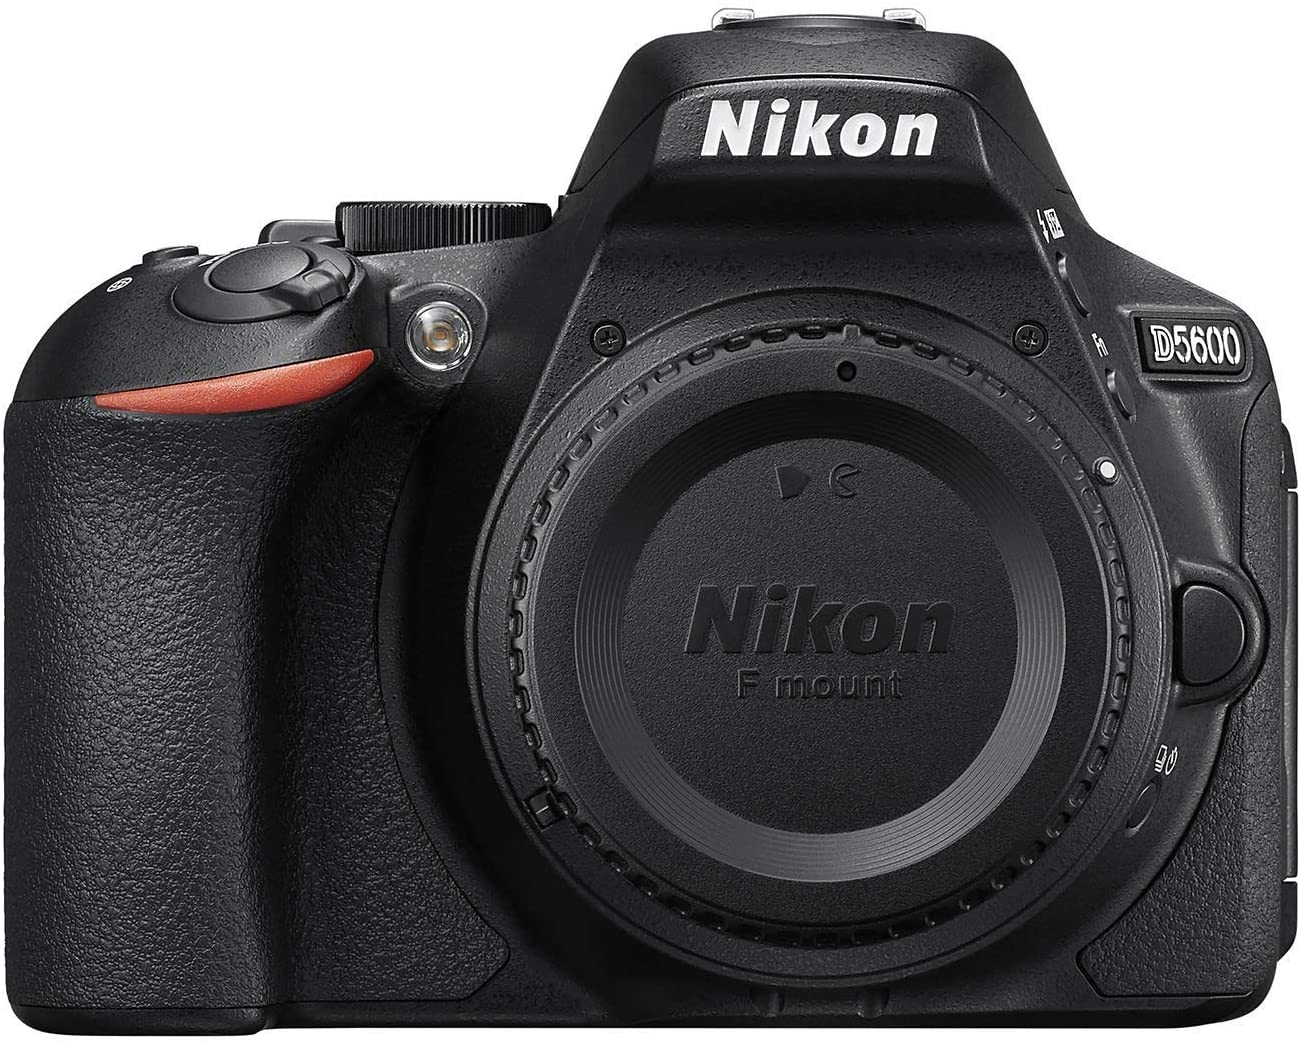 Best Deal for Nikon D5600 Camera Body